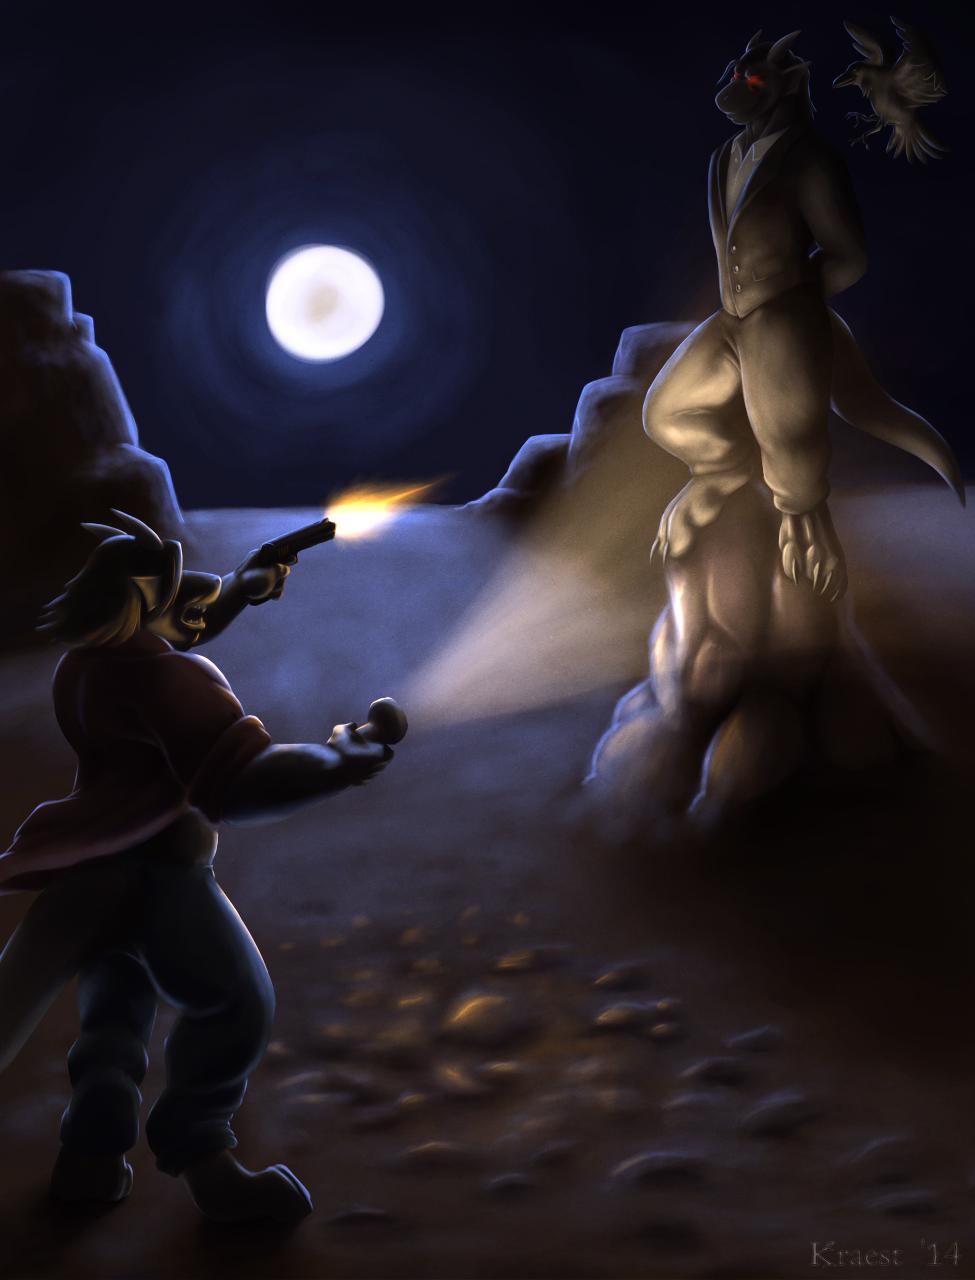 Battling The Darkness